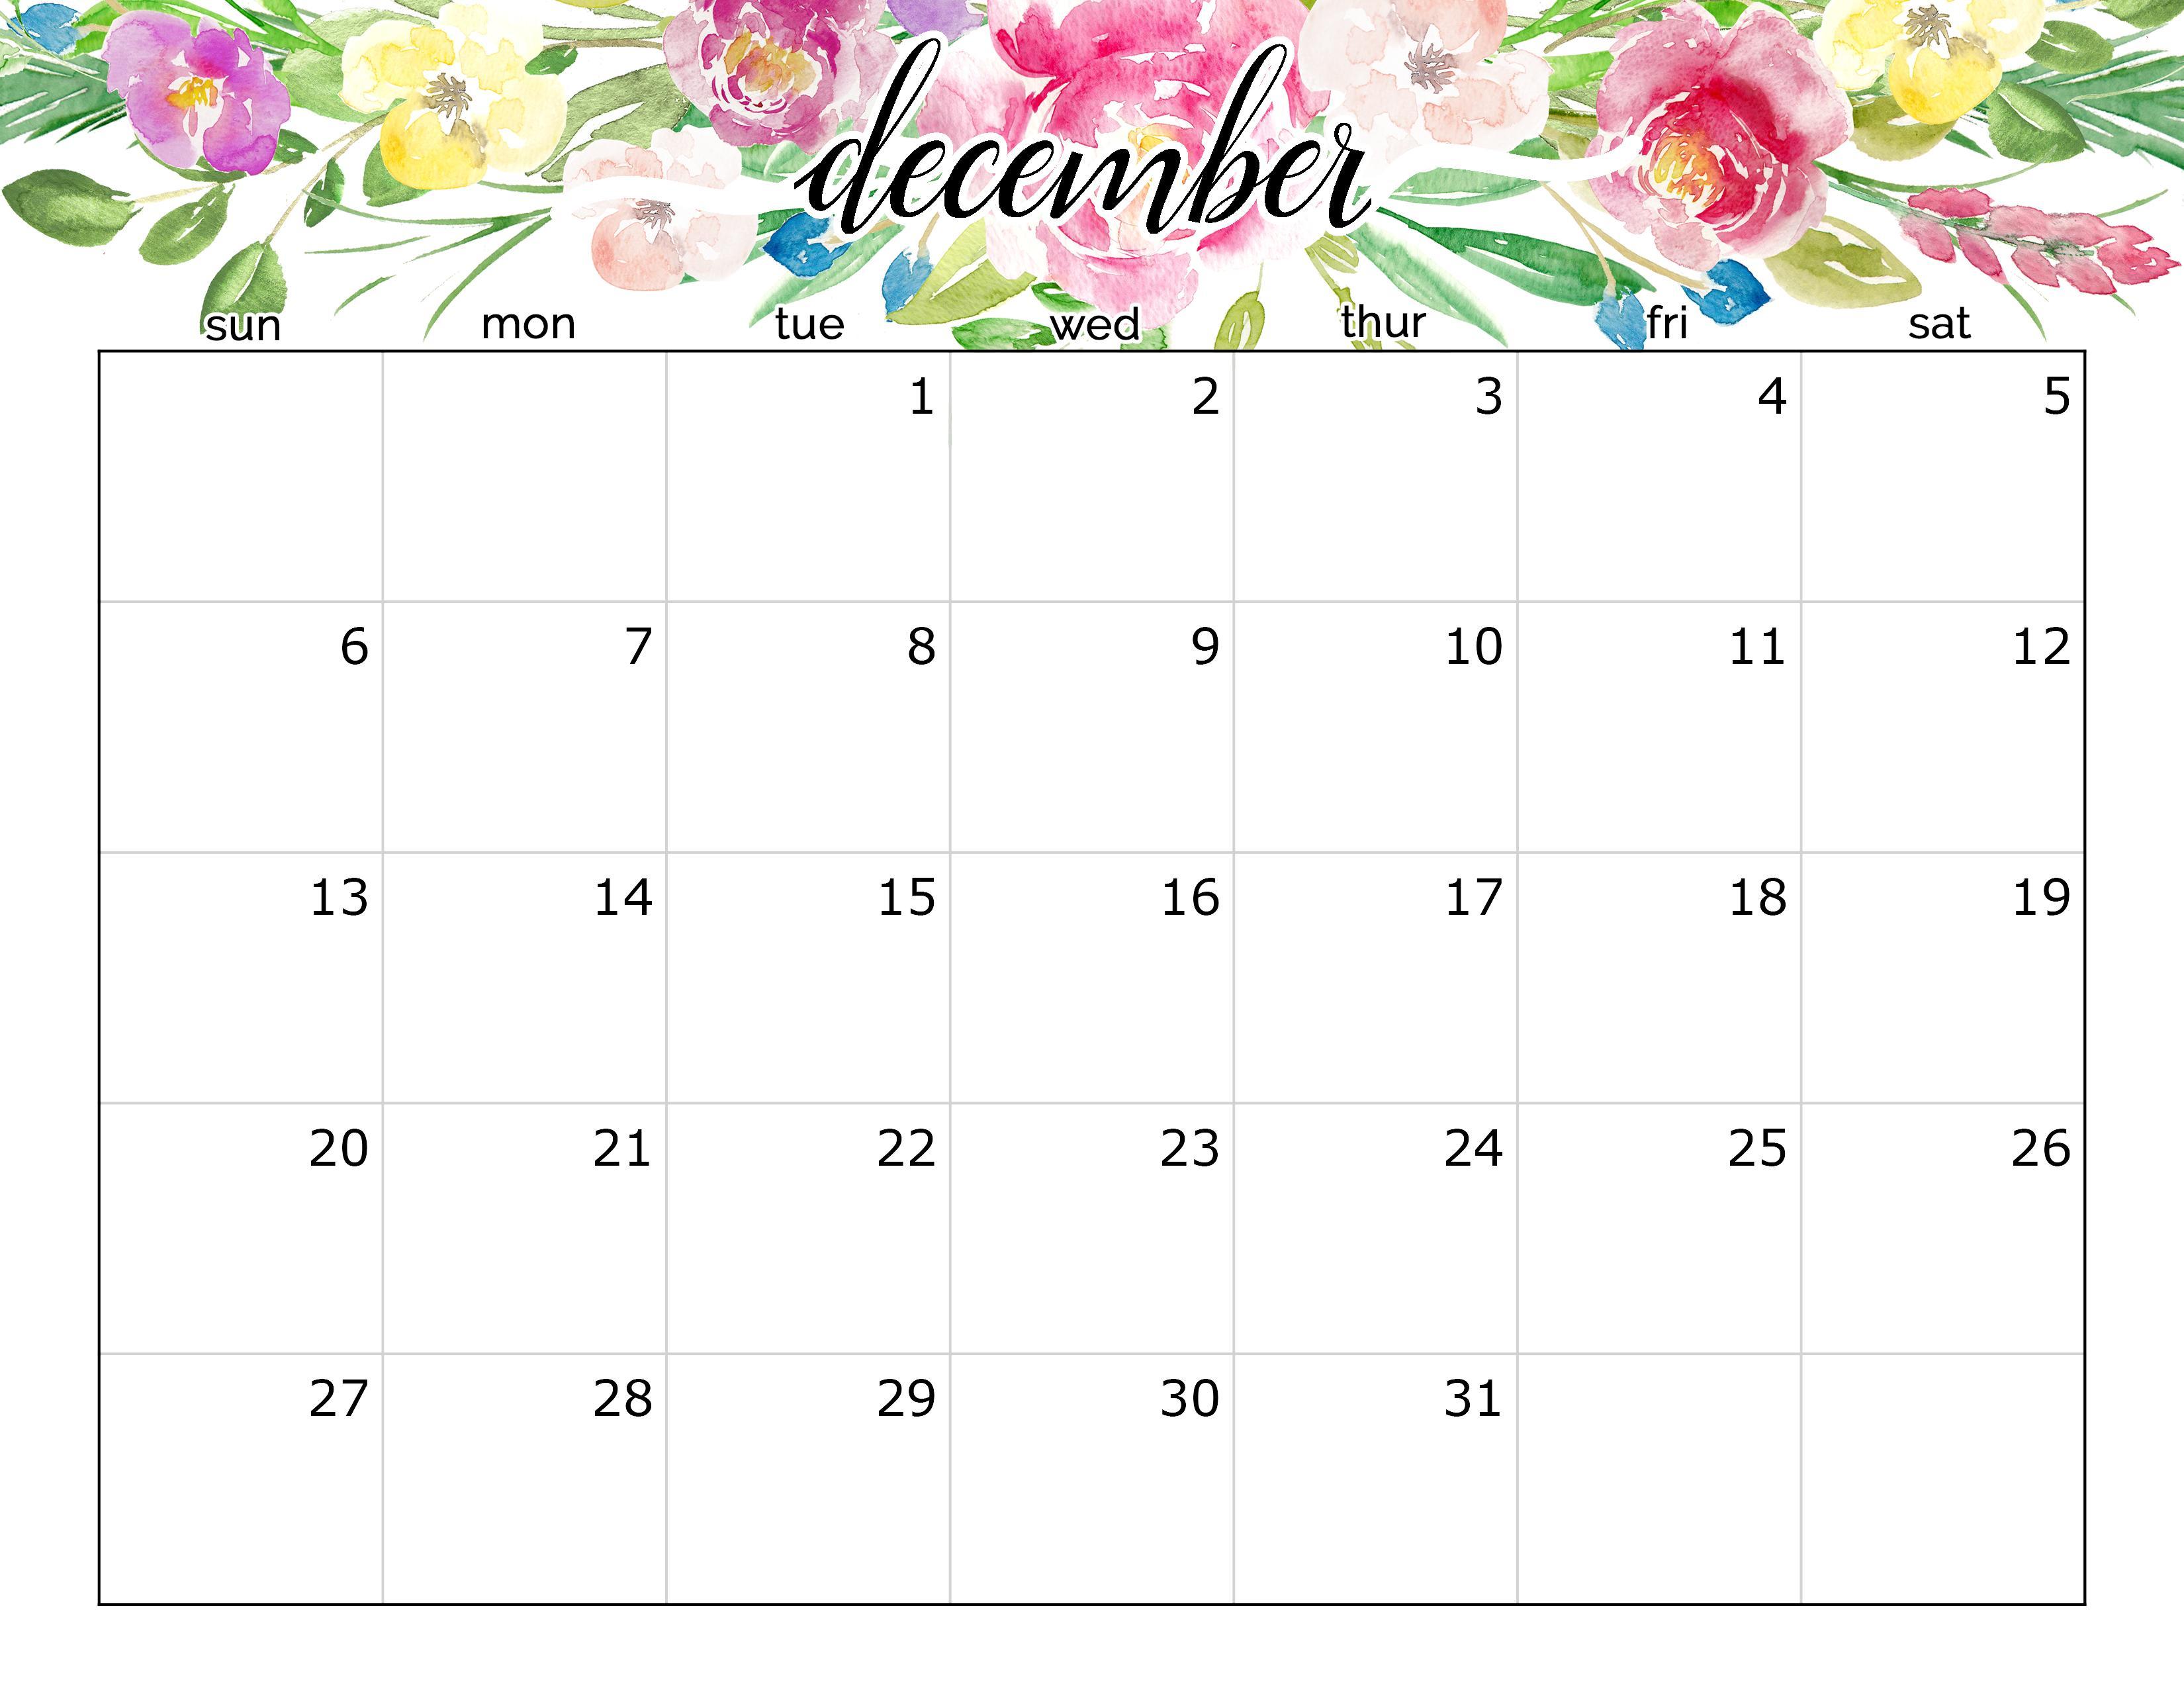 December 2020 Calendar Floral